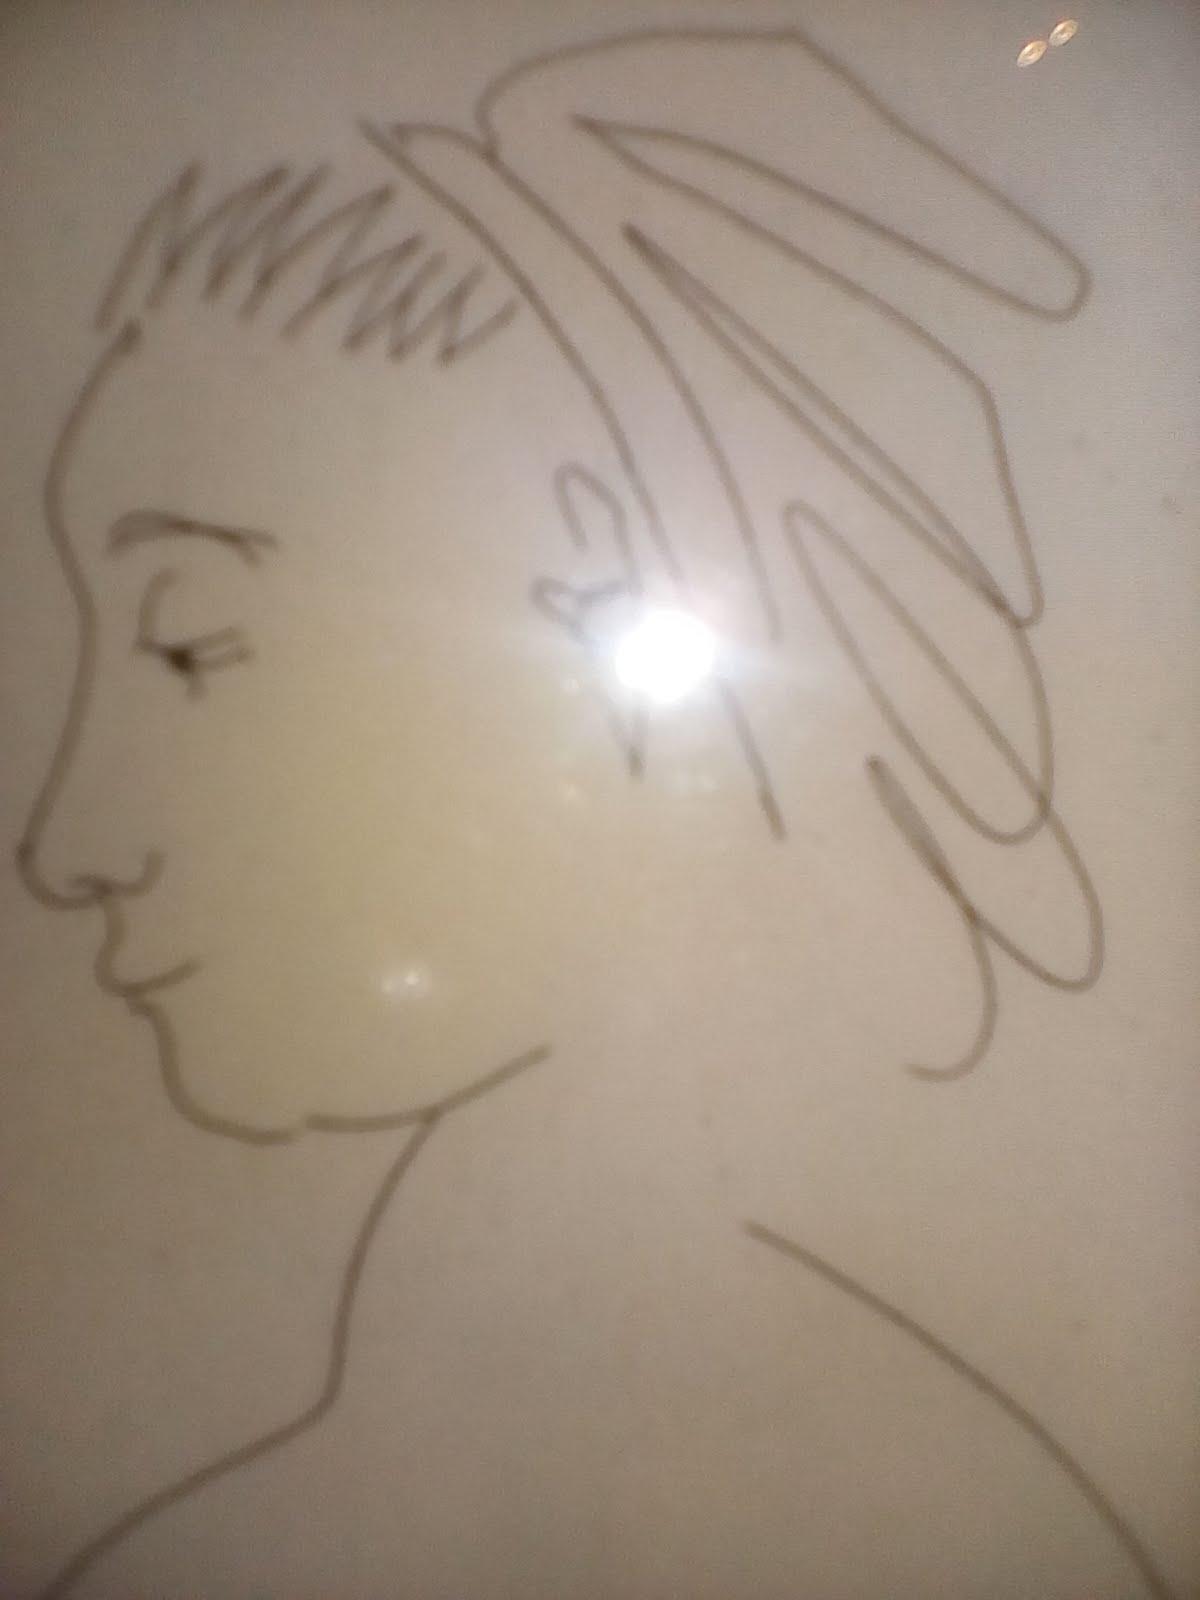 Caricatura picasso 1967